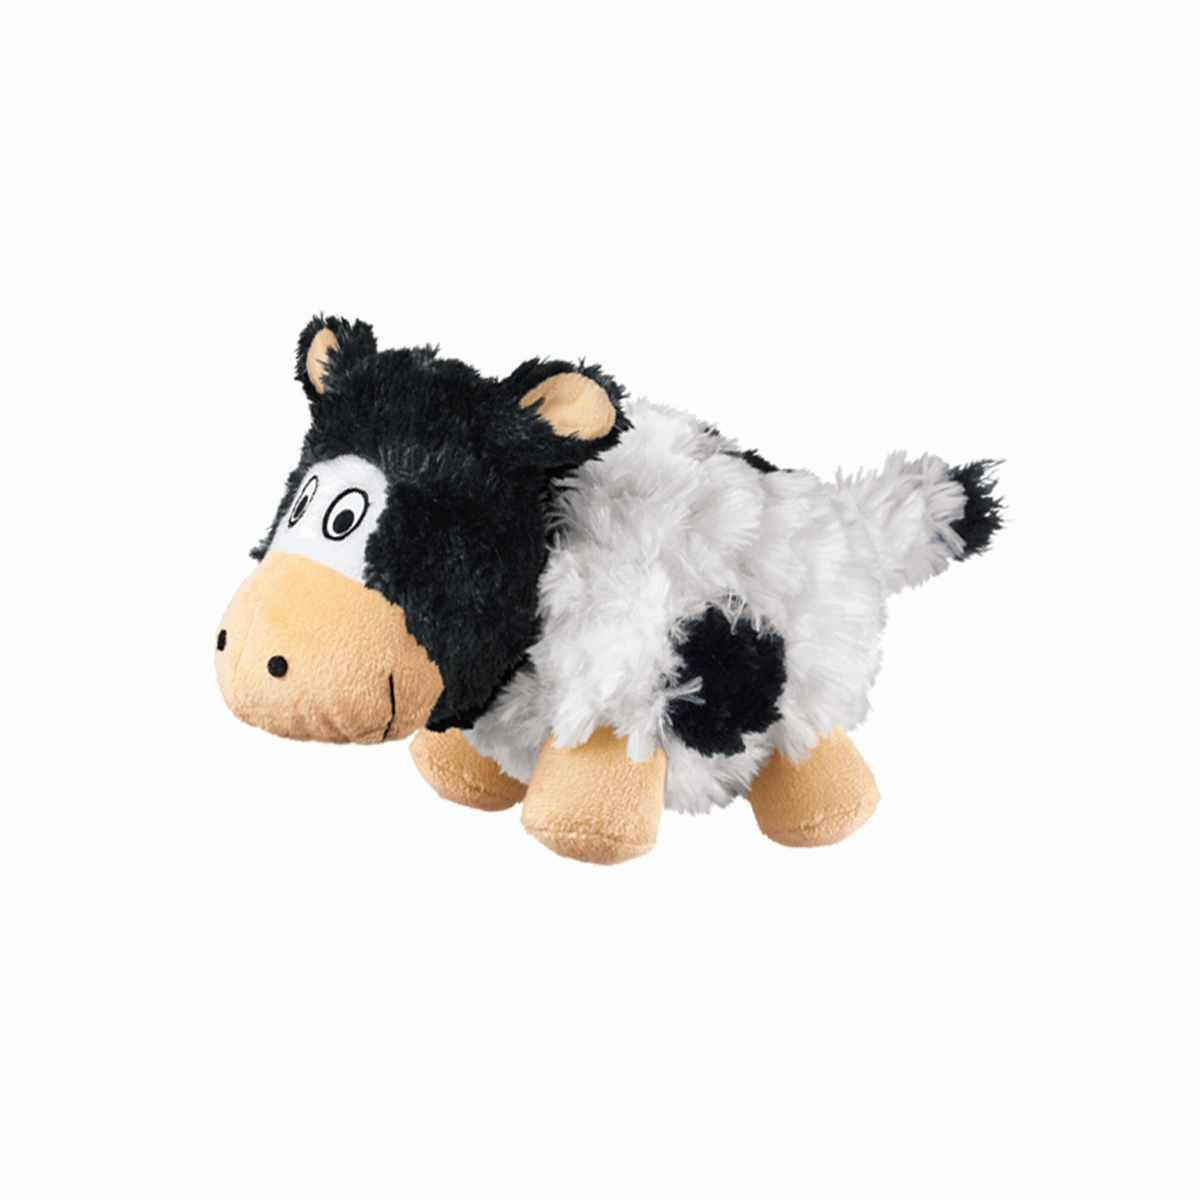 KO BARNYARD CRUNCHEEZ COW L 00001